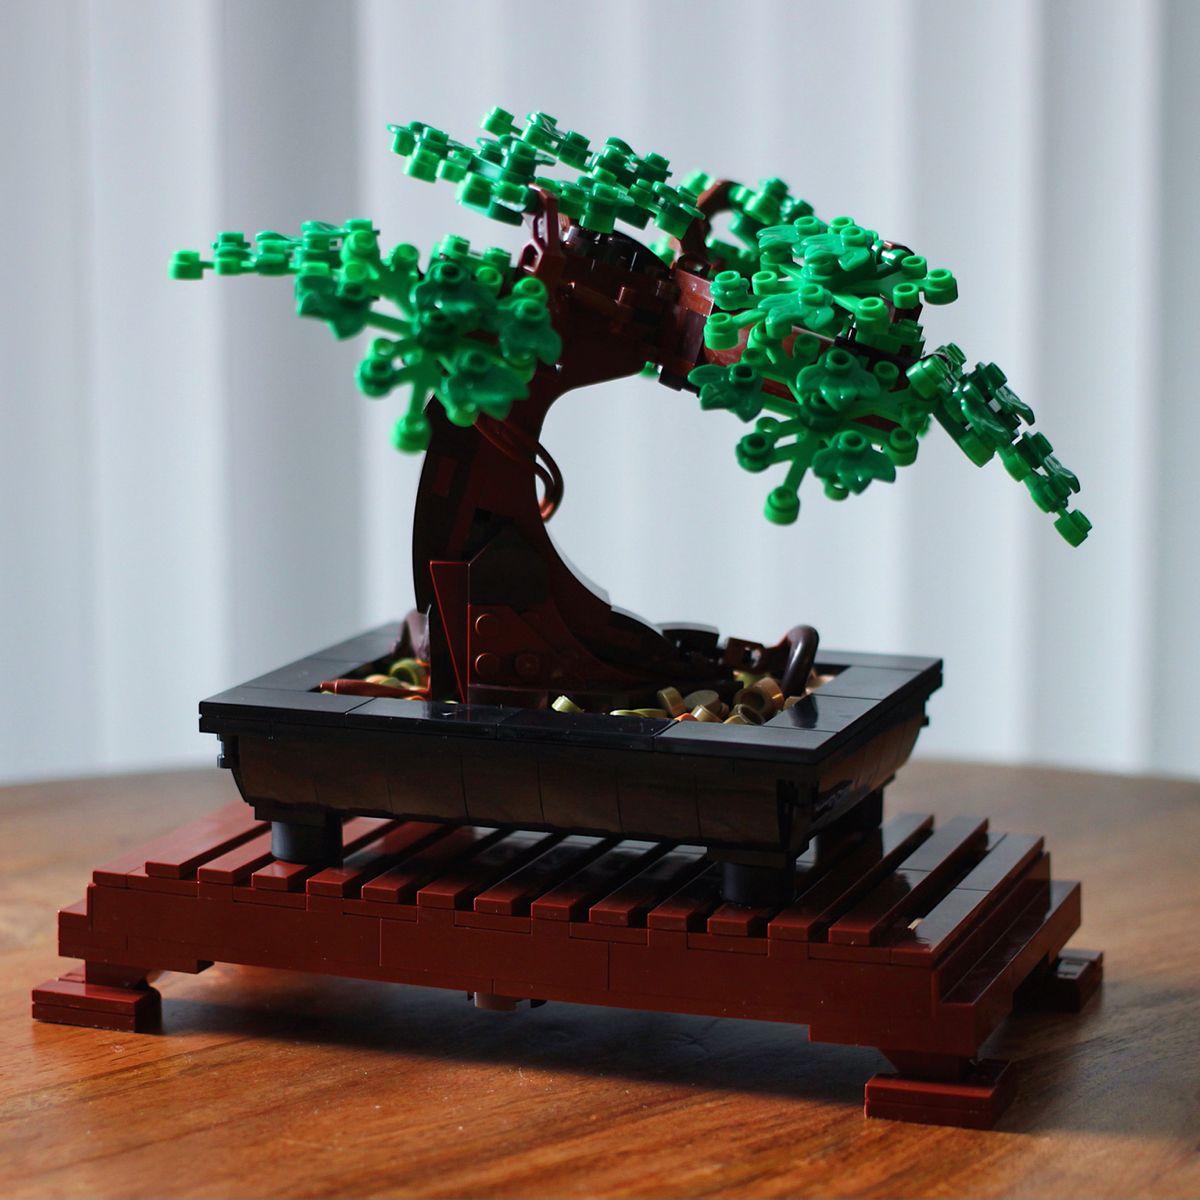 Lego Creator Expert 10281 Bonsai Tree In 2021 Bonsai Tree Lego Creator Bonsai